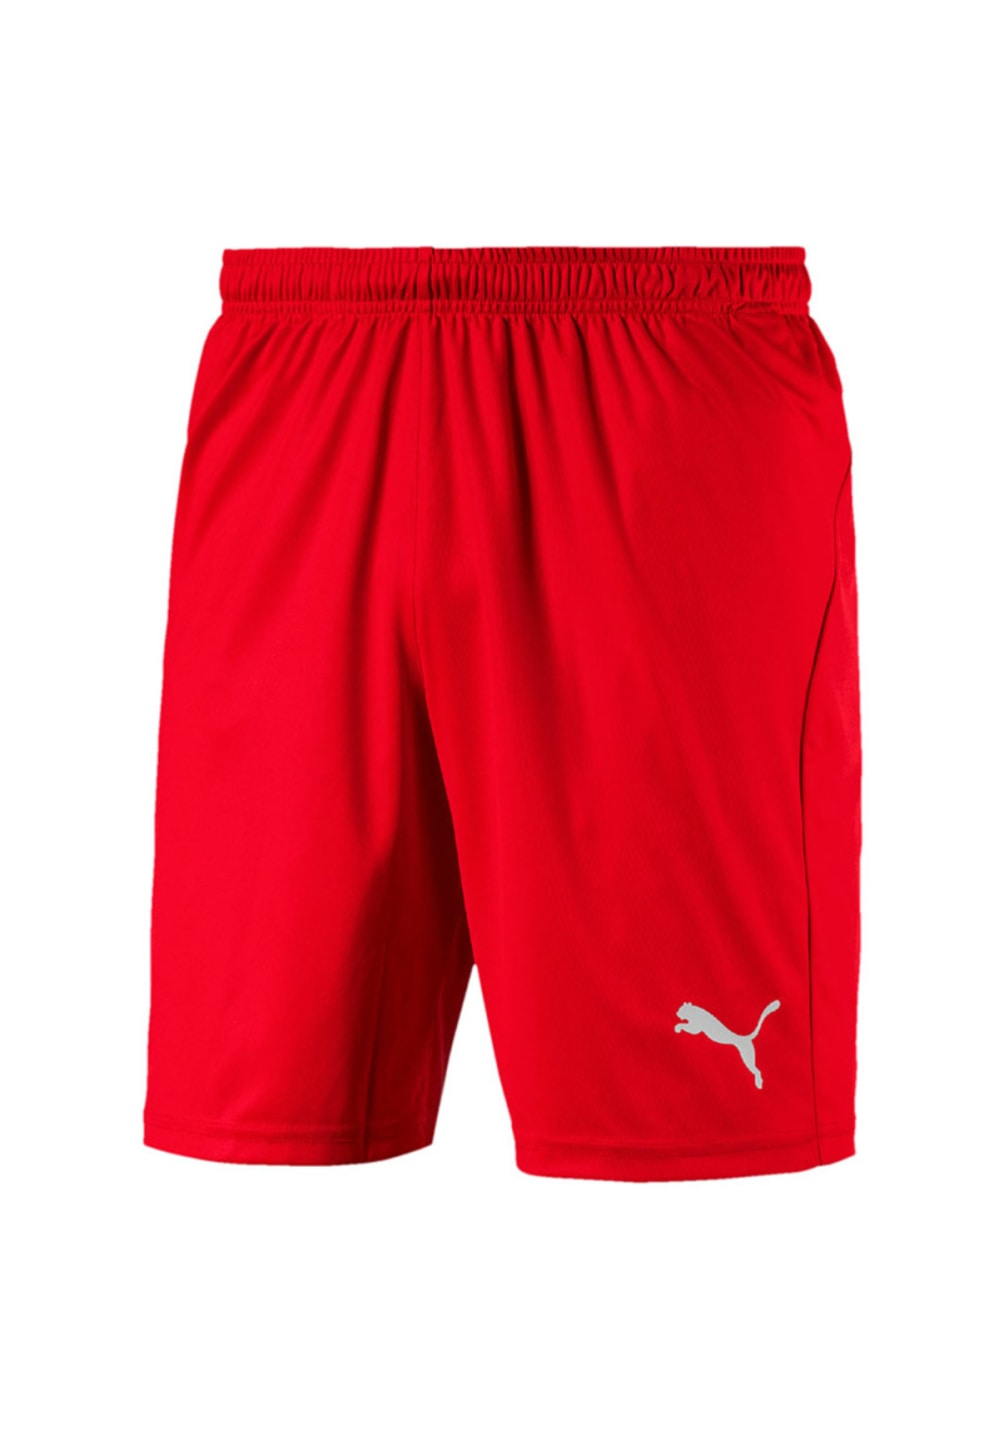 Puma Liga Shorts Core - Laufhosen für Herren - Rot, Gr. 3XL